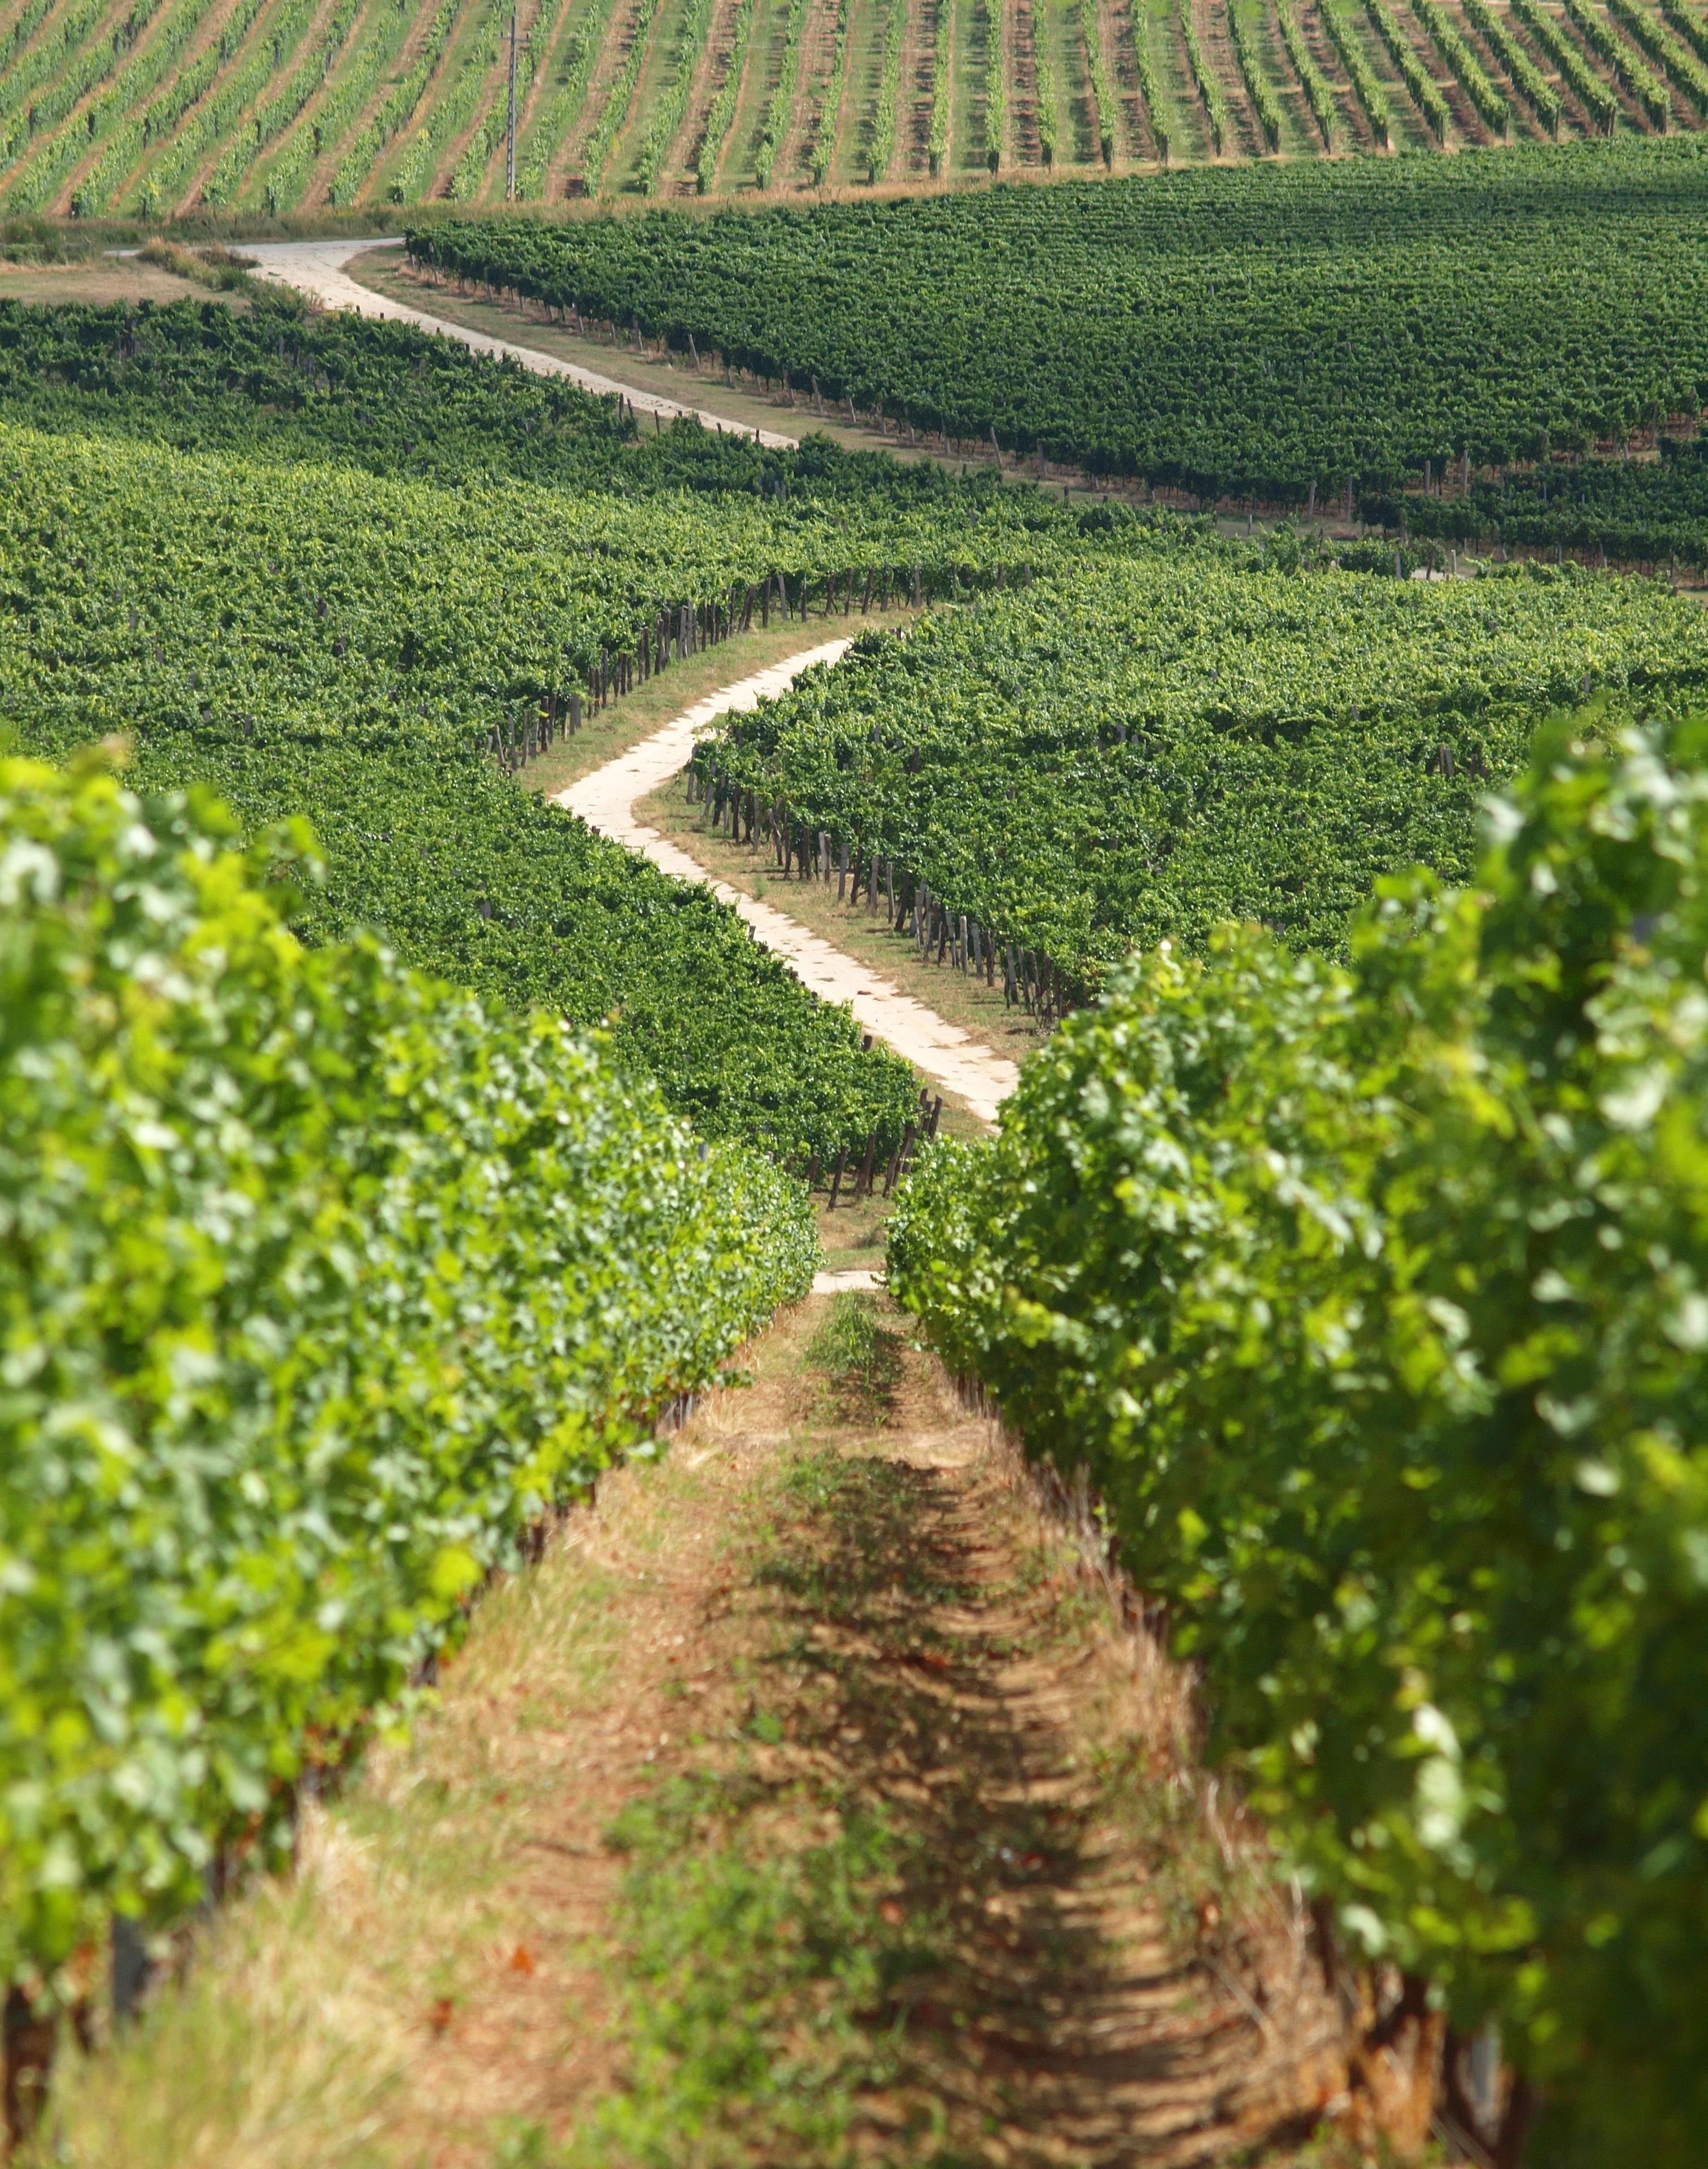 Gambar Pohon Kebun Anggur Bidang Tanah Pertanian Hijau